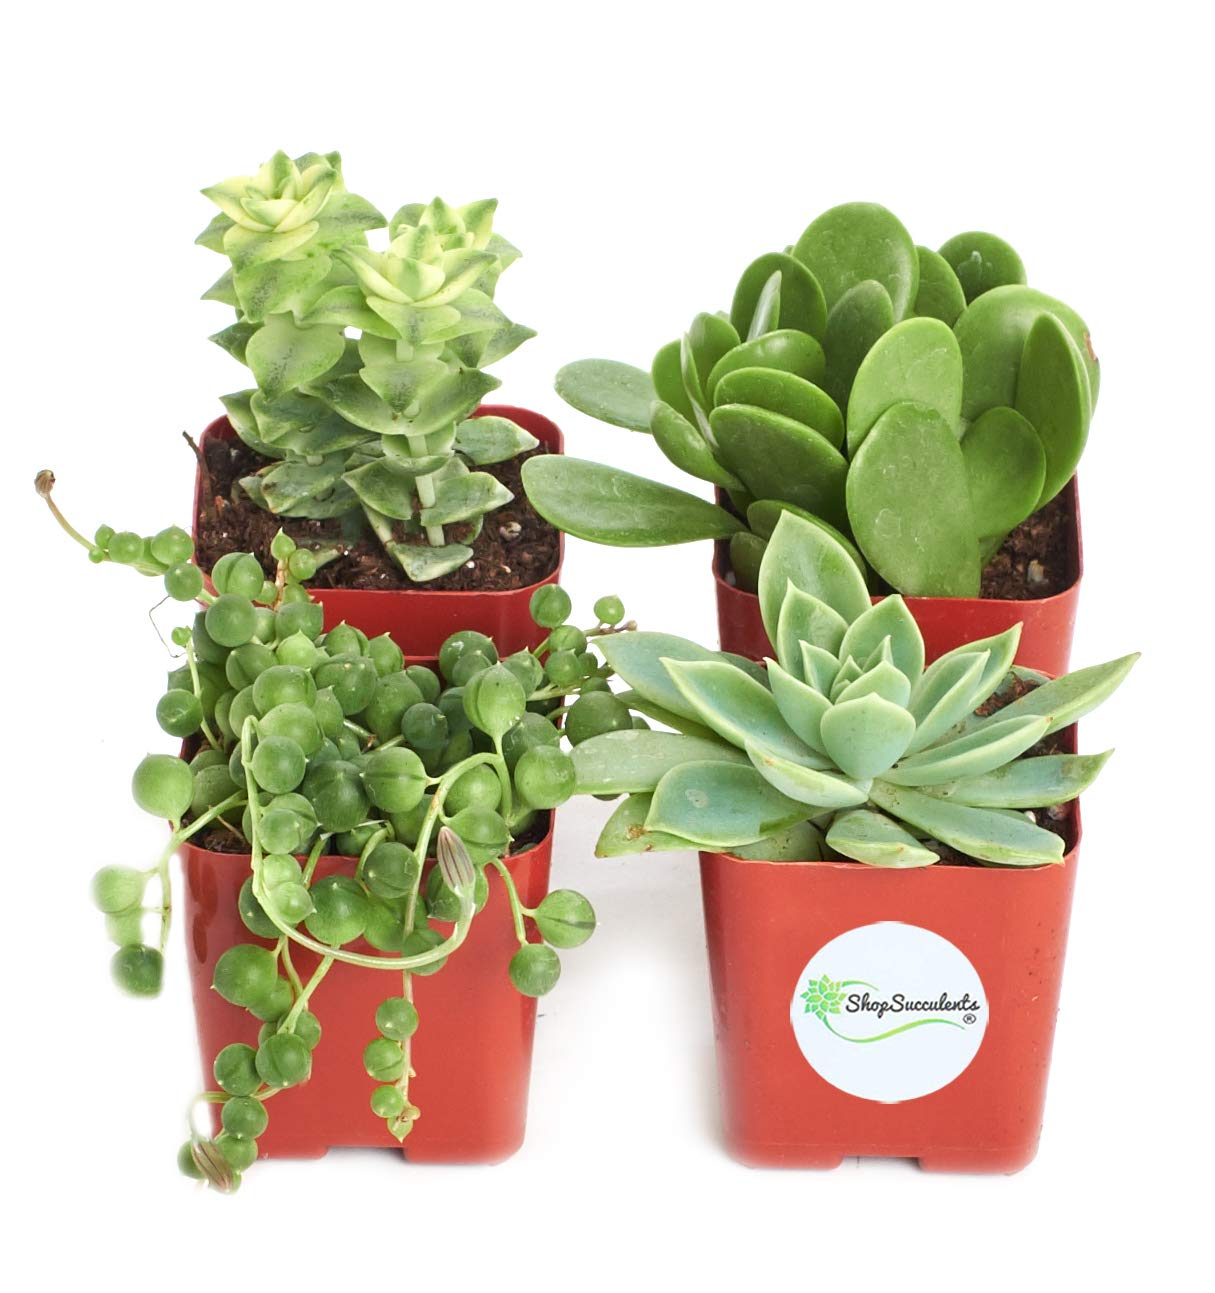 Shop Succulents Green Succulent (Collection of 4)